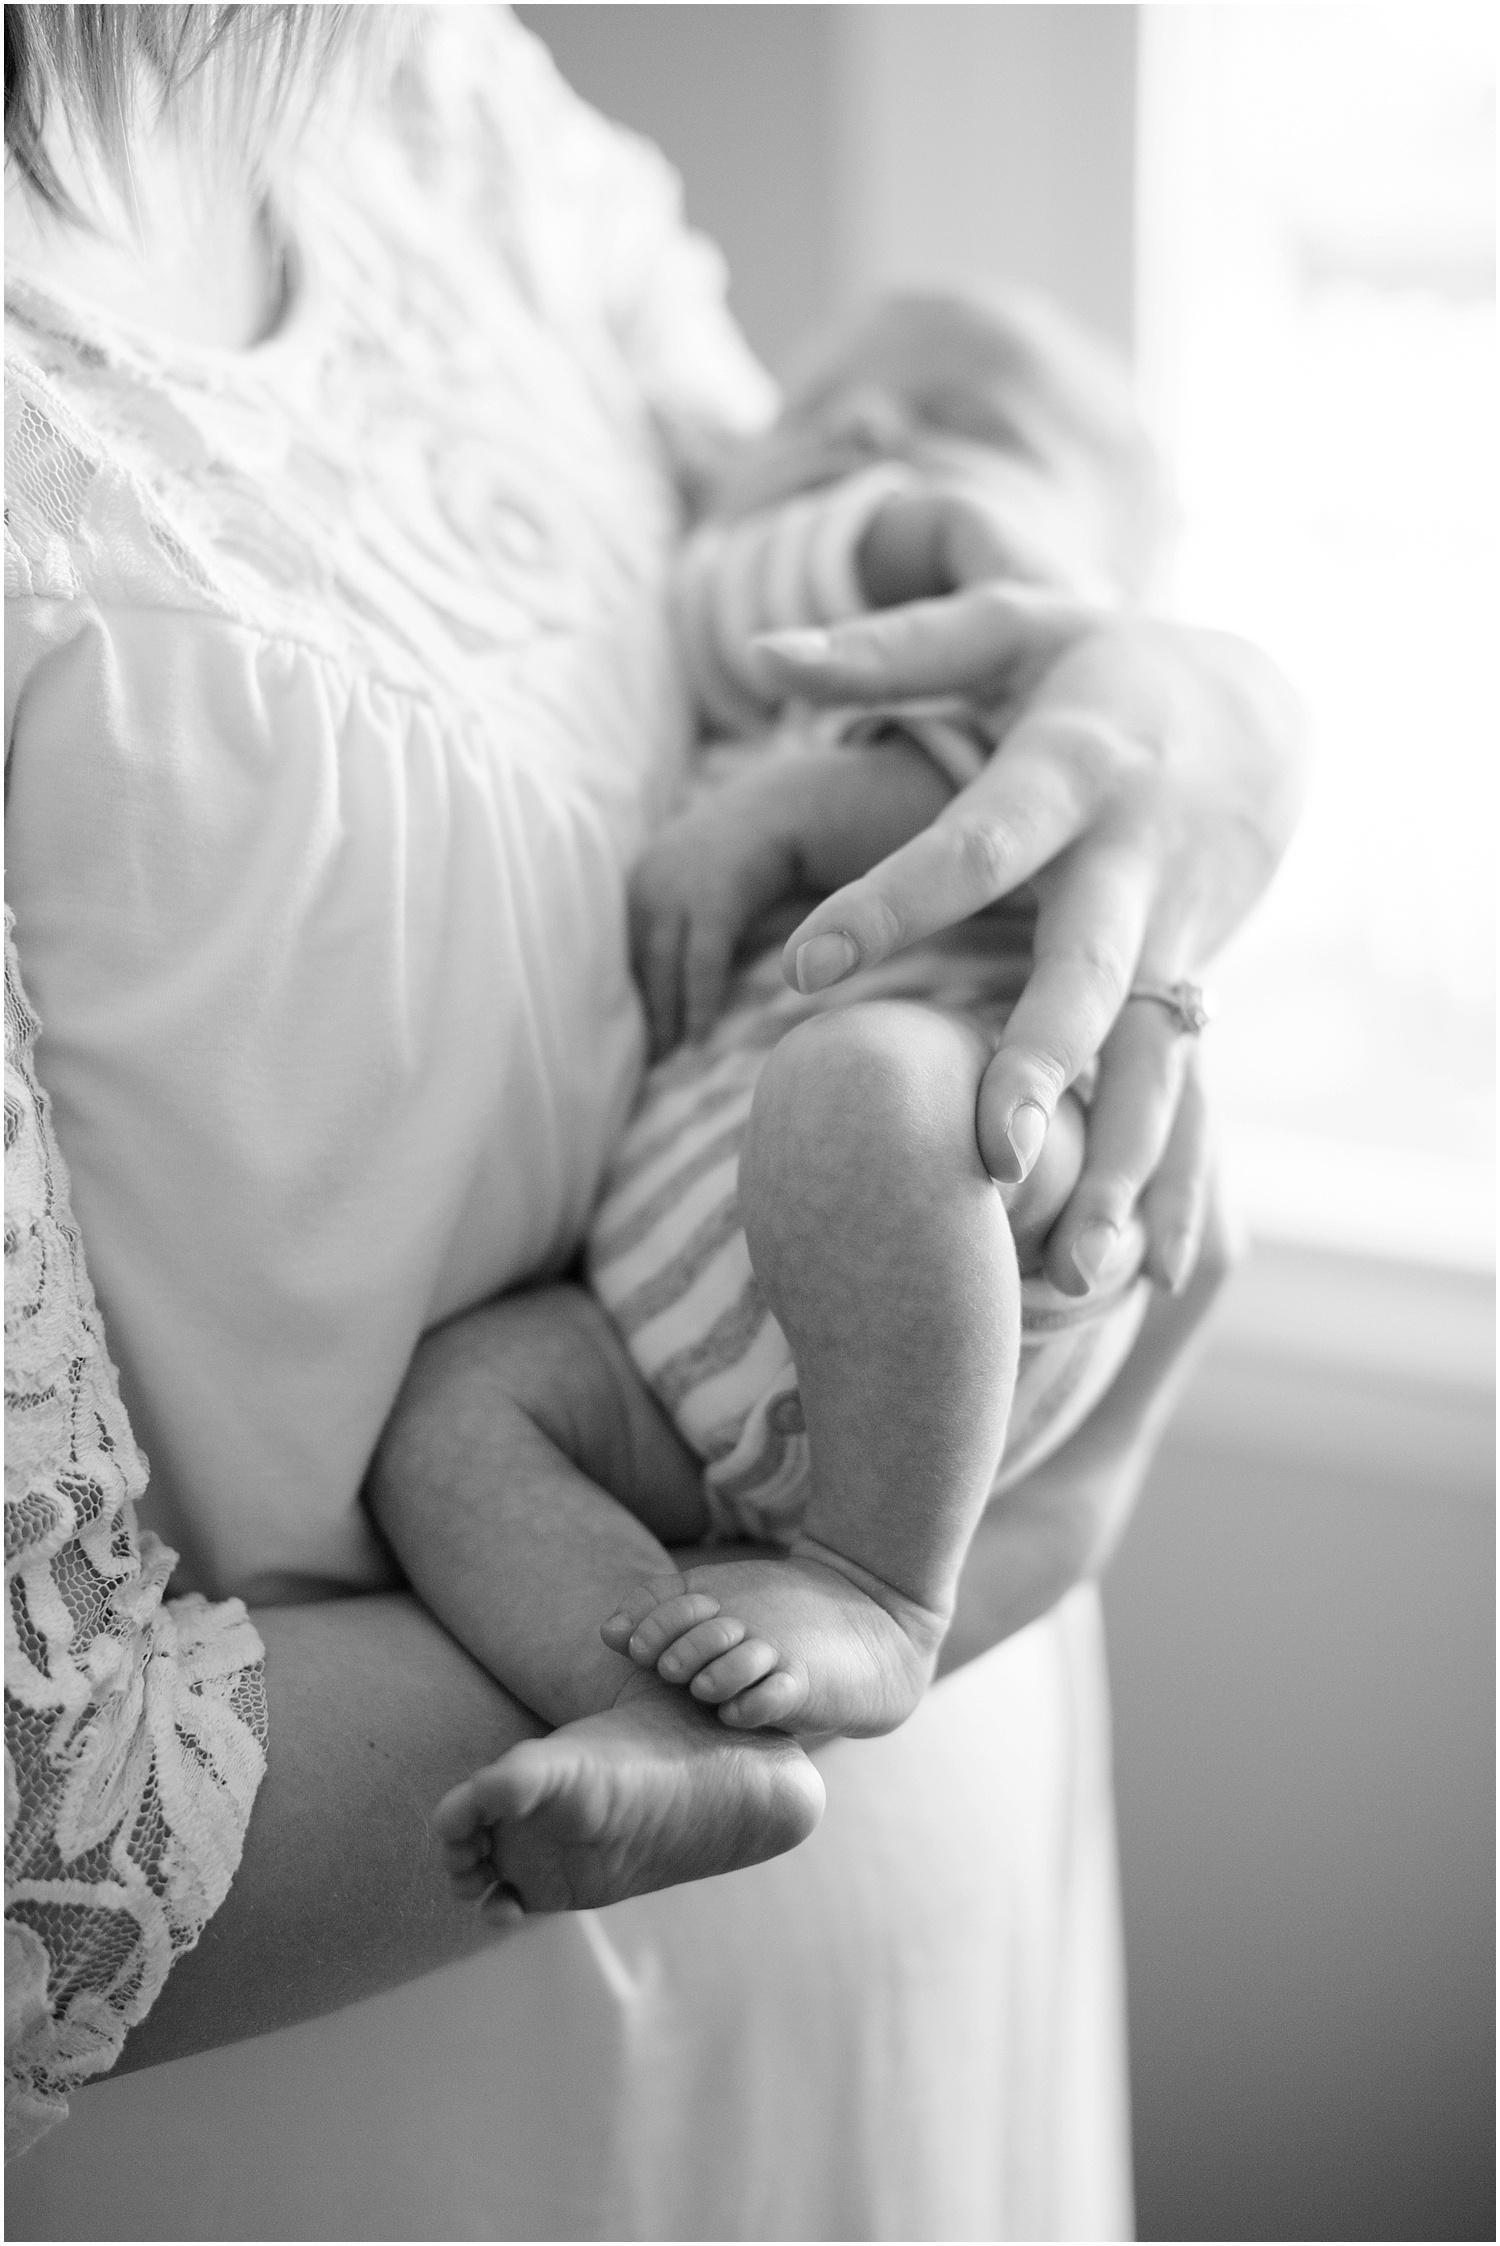 Ashley Powell Photography Grayson Newborn Session_0066.jpg